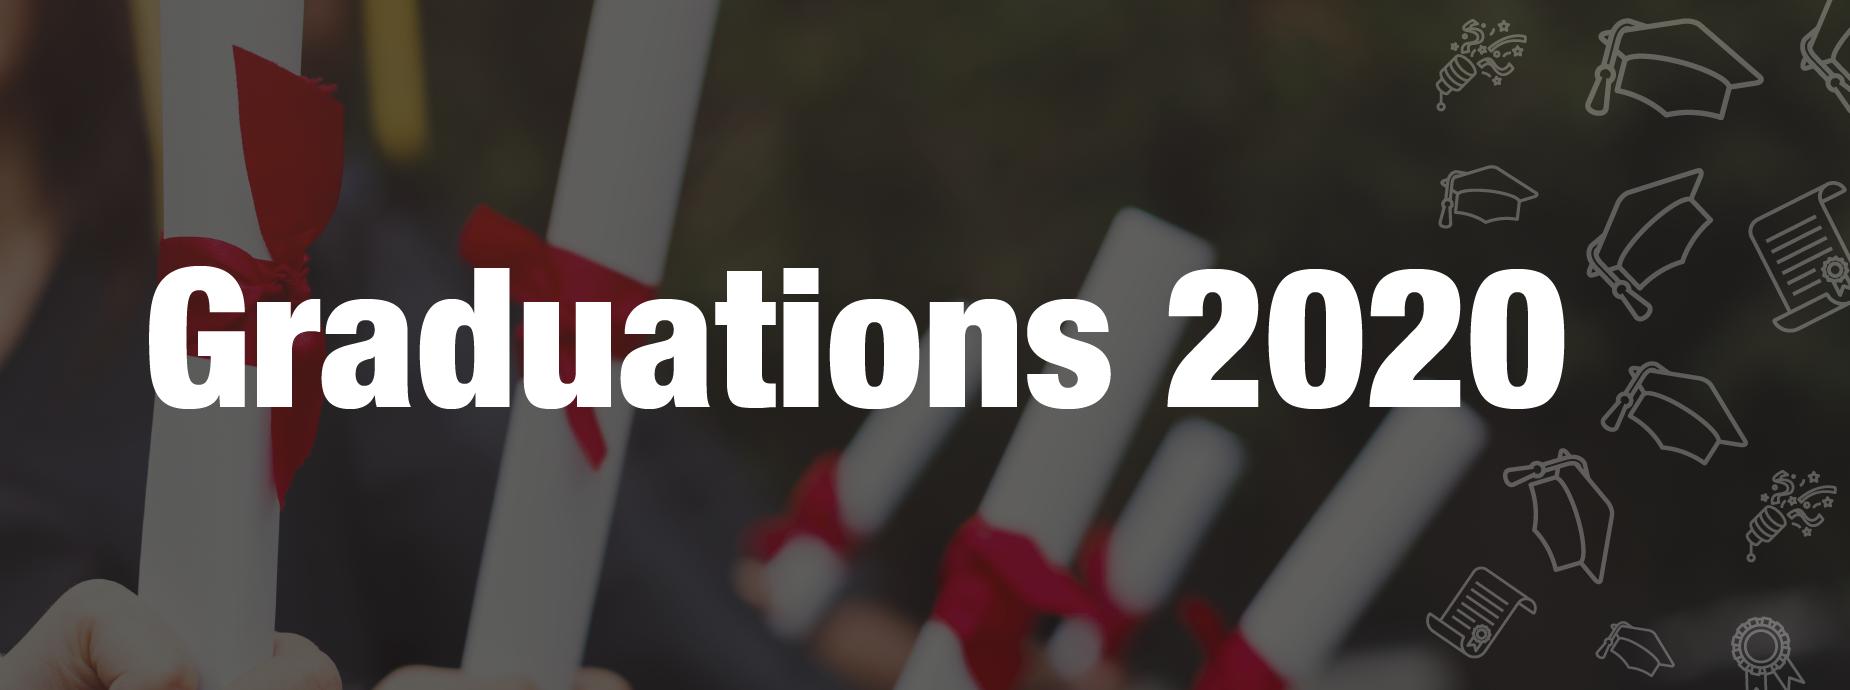 Graduations 2020 Banner